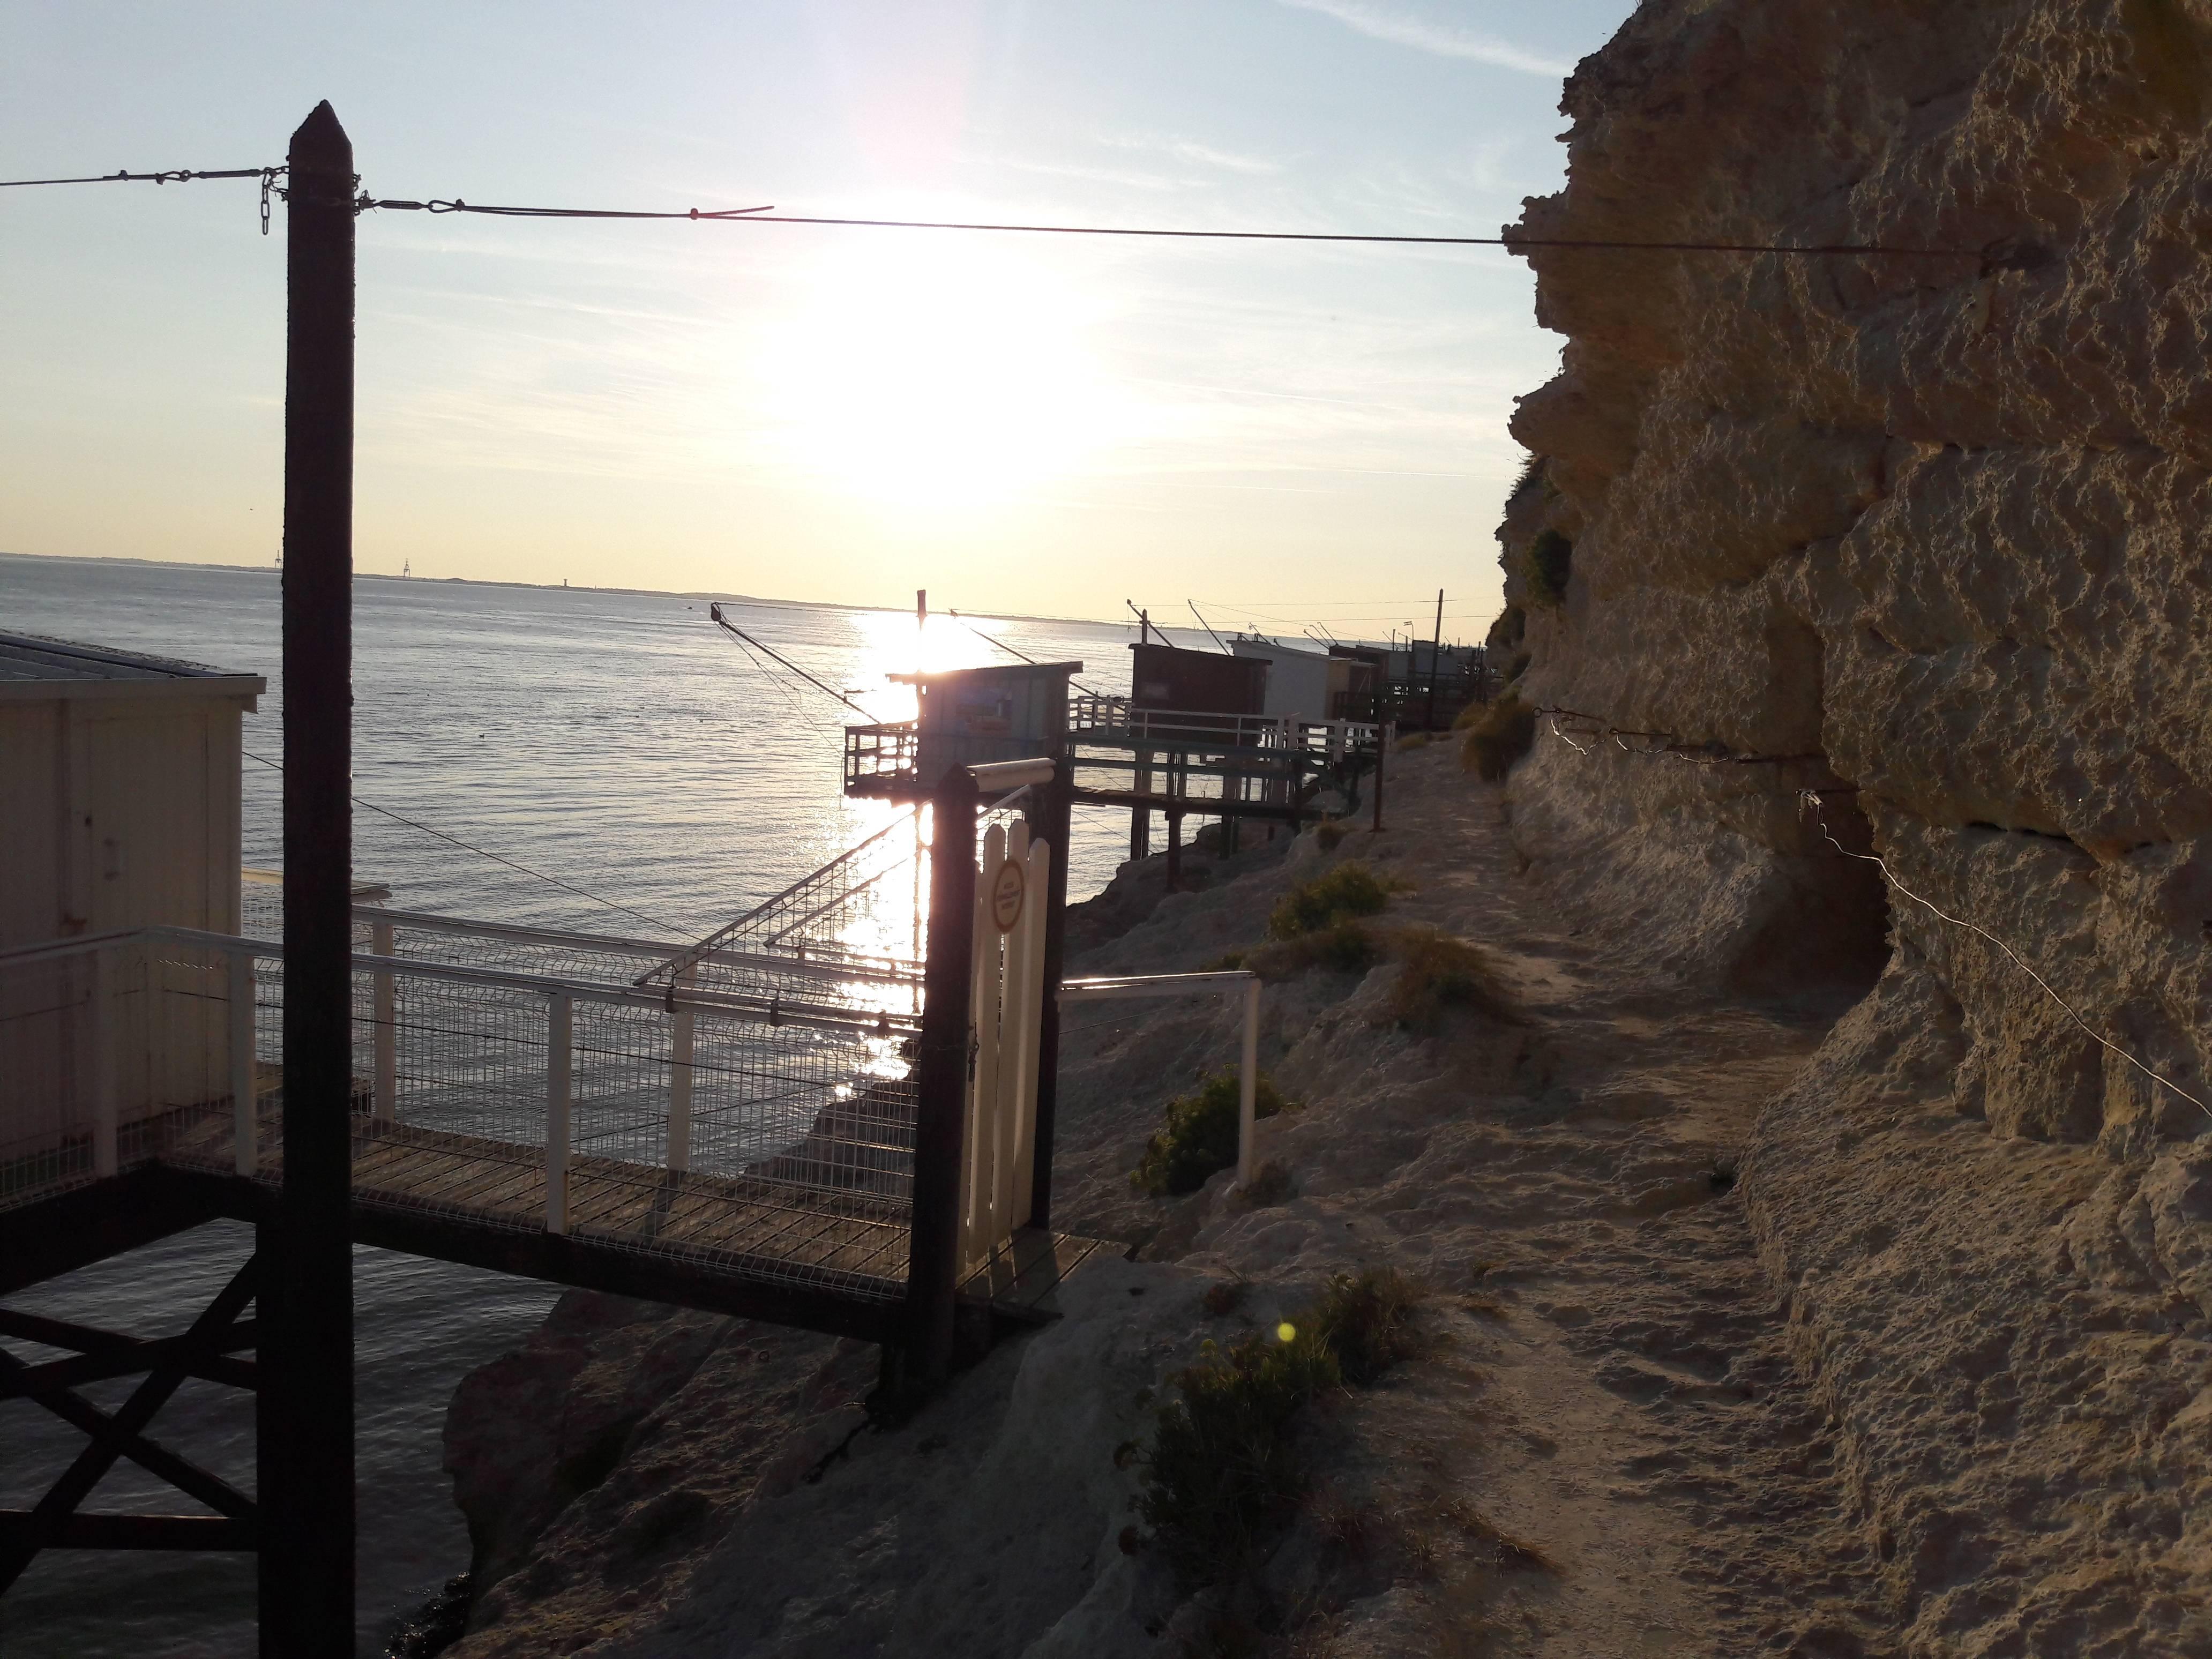 Photo 2: Balade au pied des falaises de Meschers sur Gironde